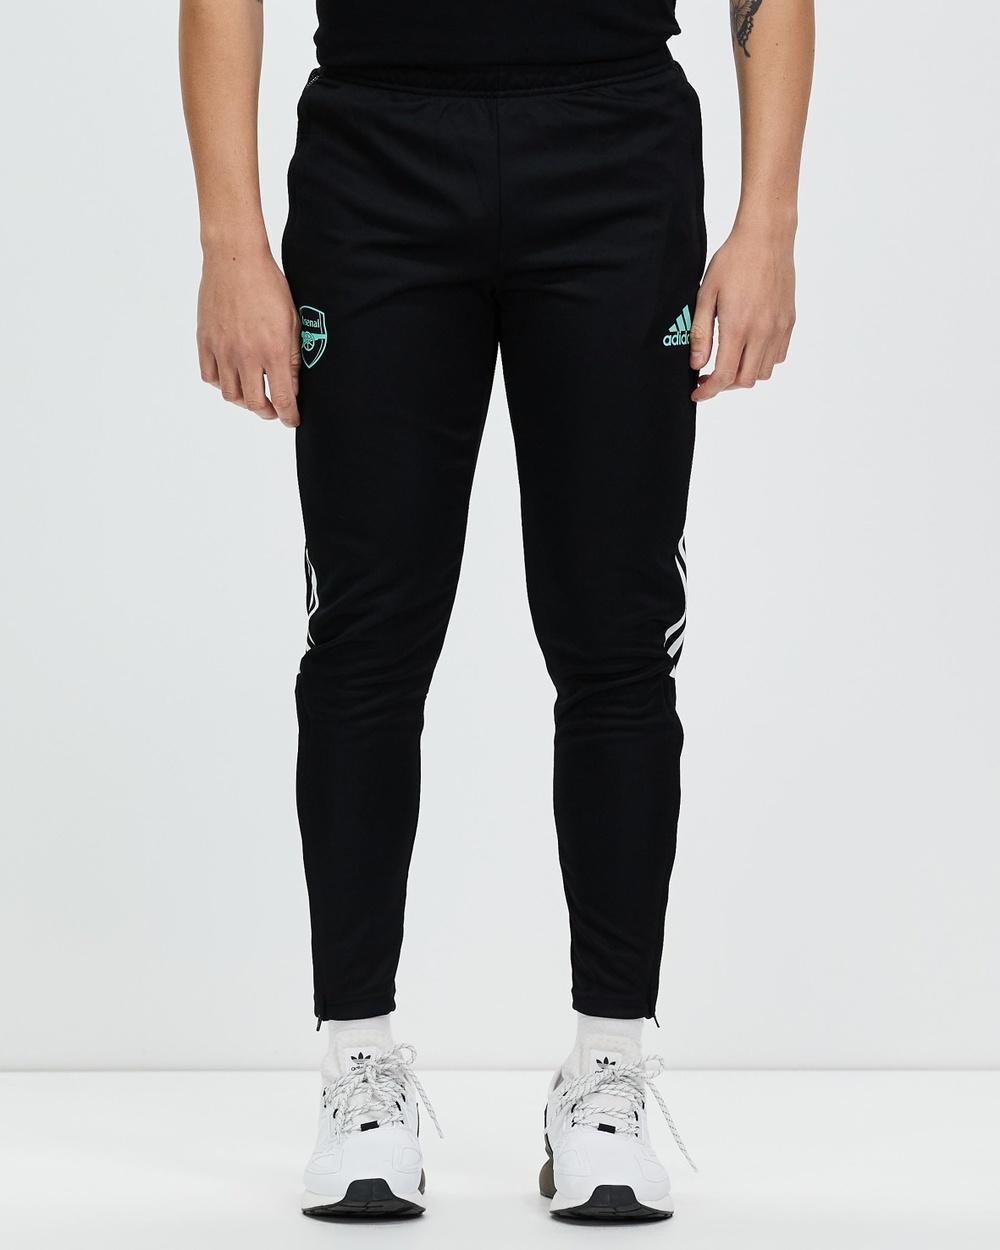 adidas Performance Arsenal Tiro Training Pants Track Black